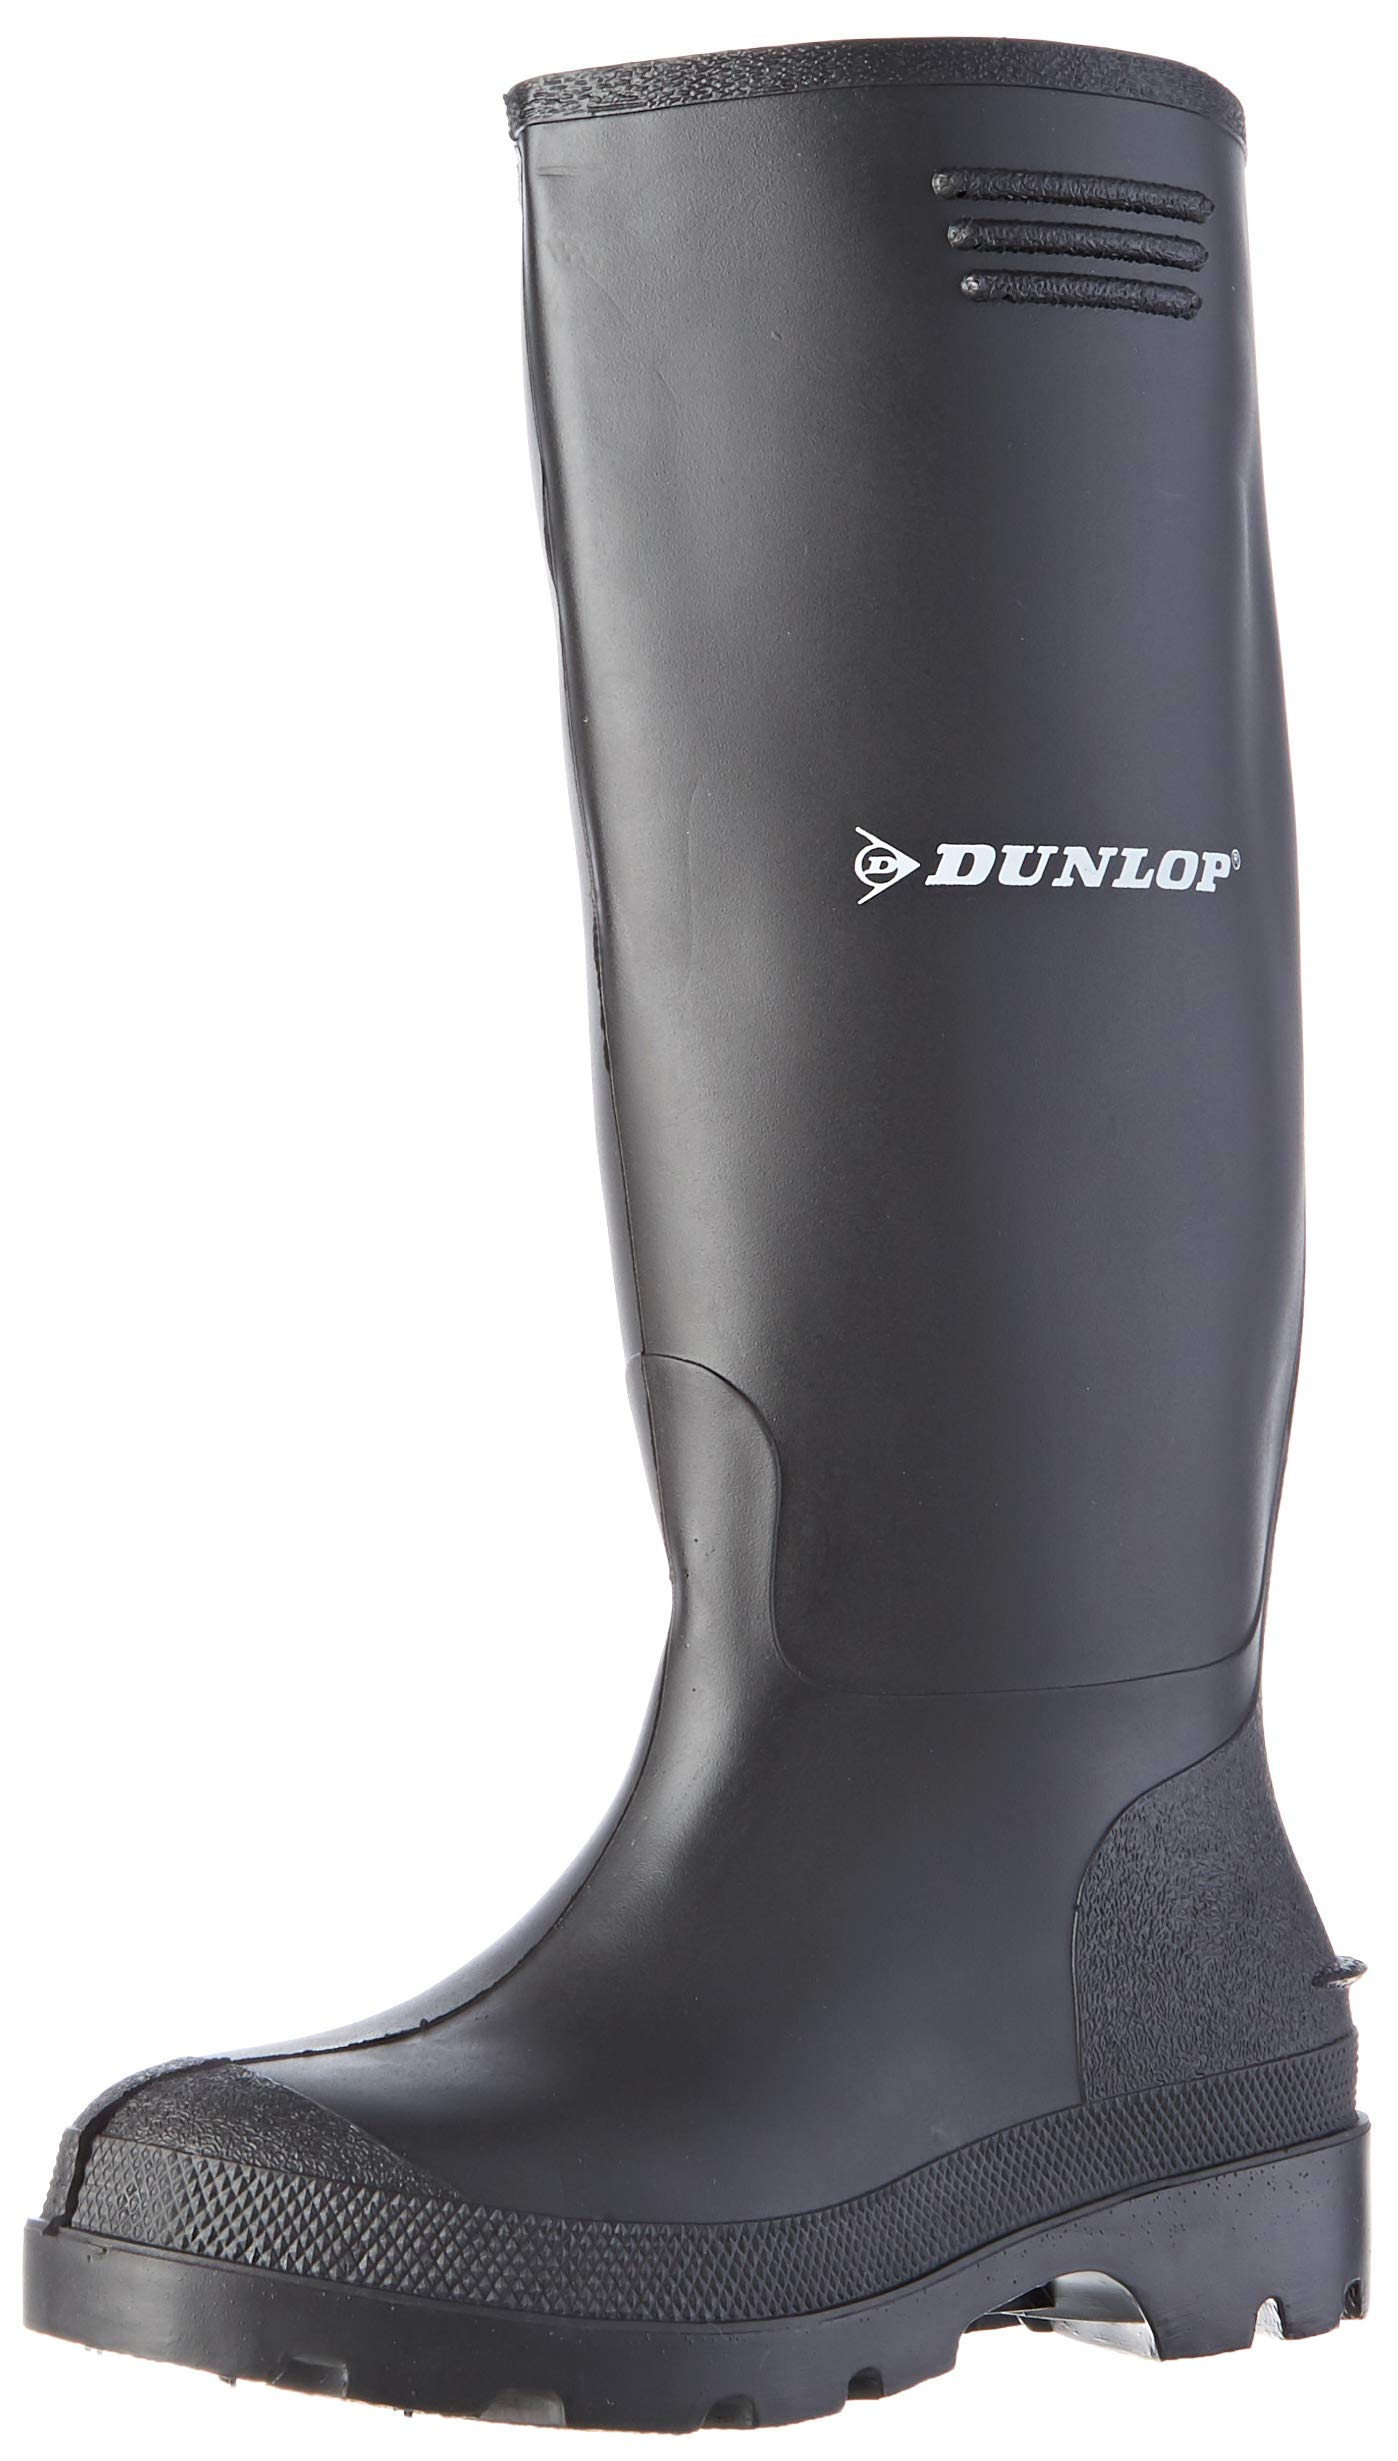 Dunlop Protective Footwear (DUO19) Unisex Dunlop Pricemastor Wellington Boots, Black, 12.5 UK 1